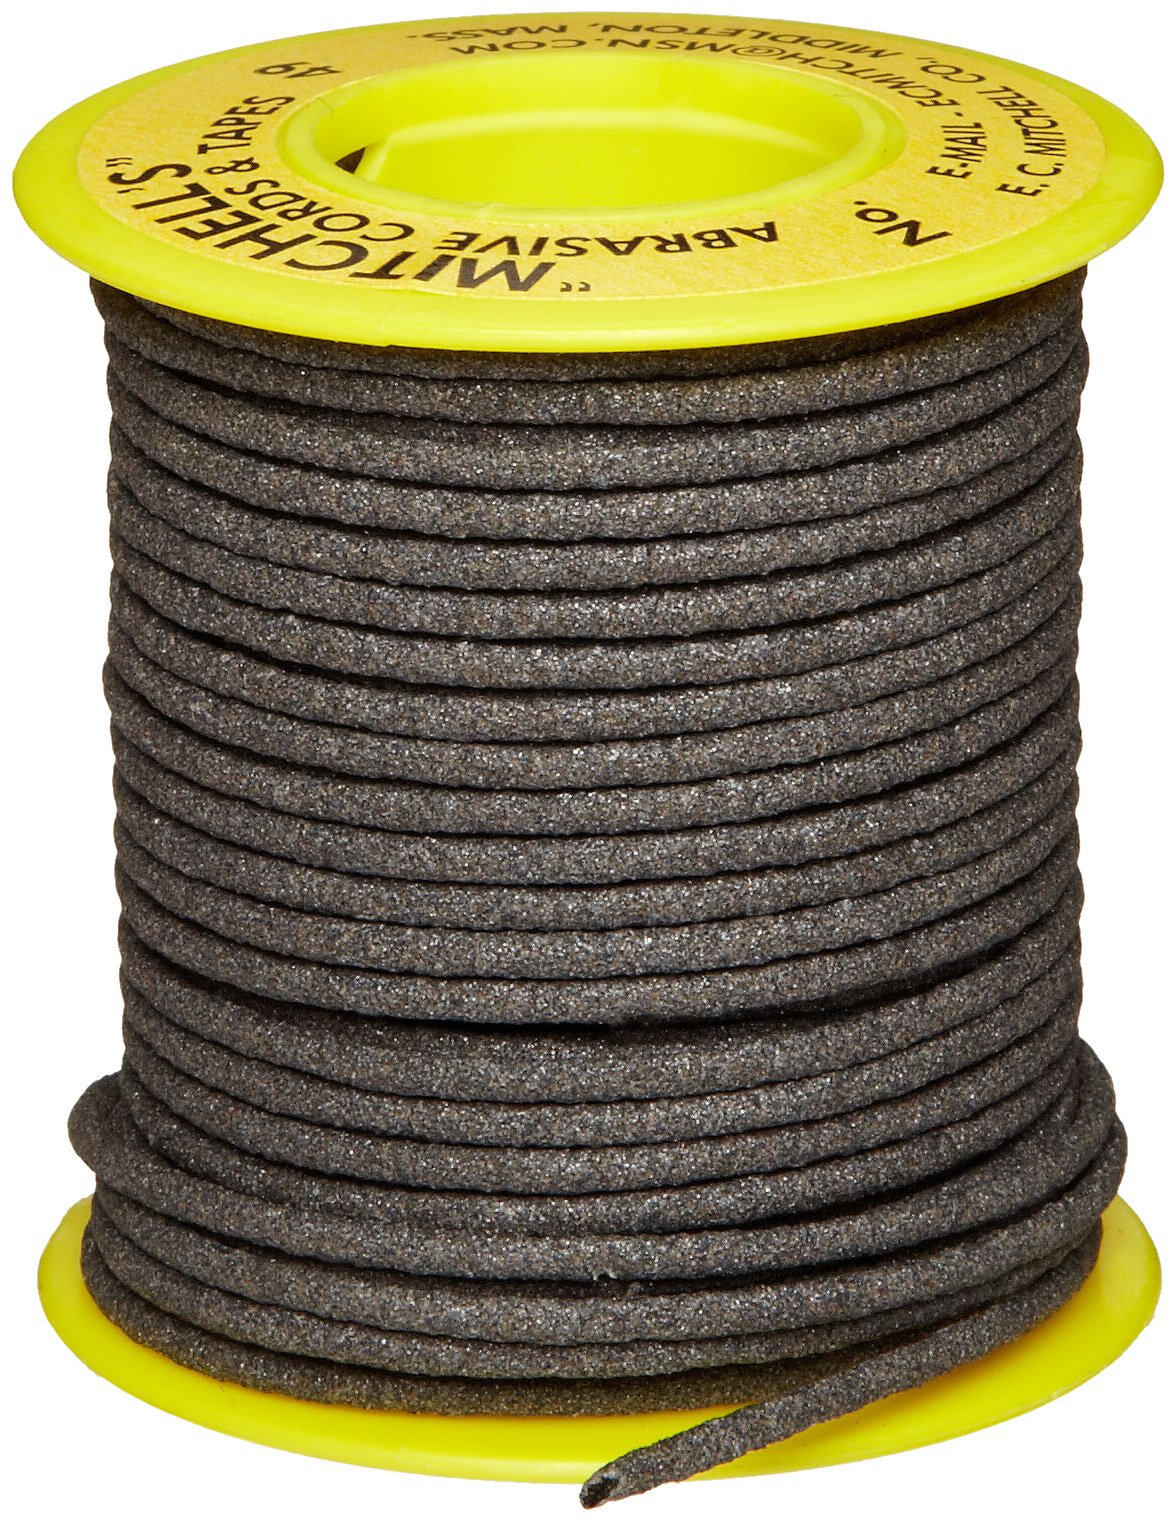 Mitchell Abrasives 58 Flat Abrasive Tape, Aluminum Oxide 150 Grit 3/16'' Wide x 50 Feet